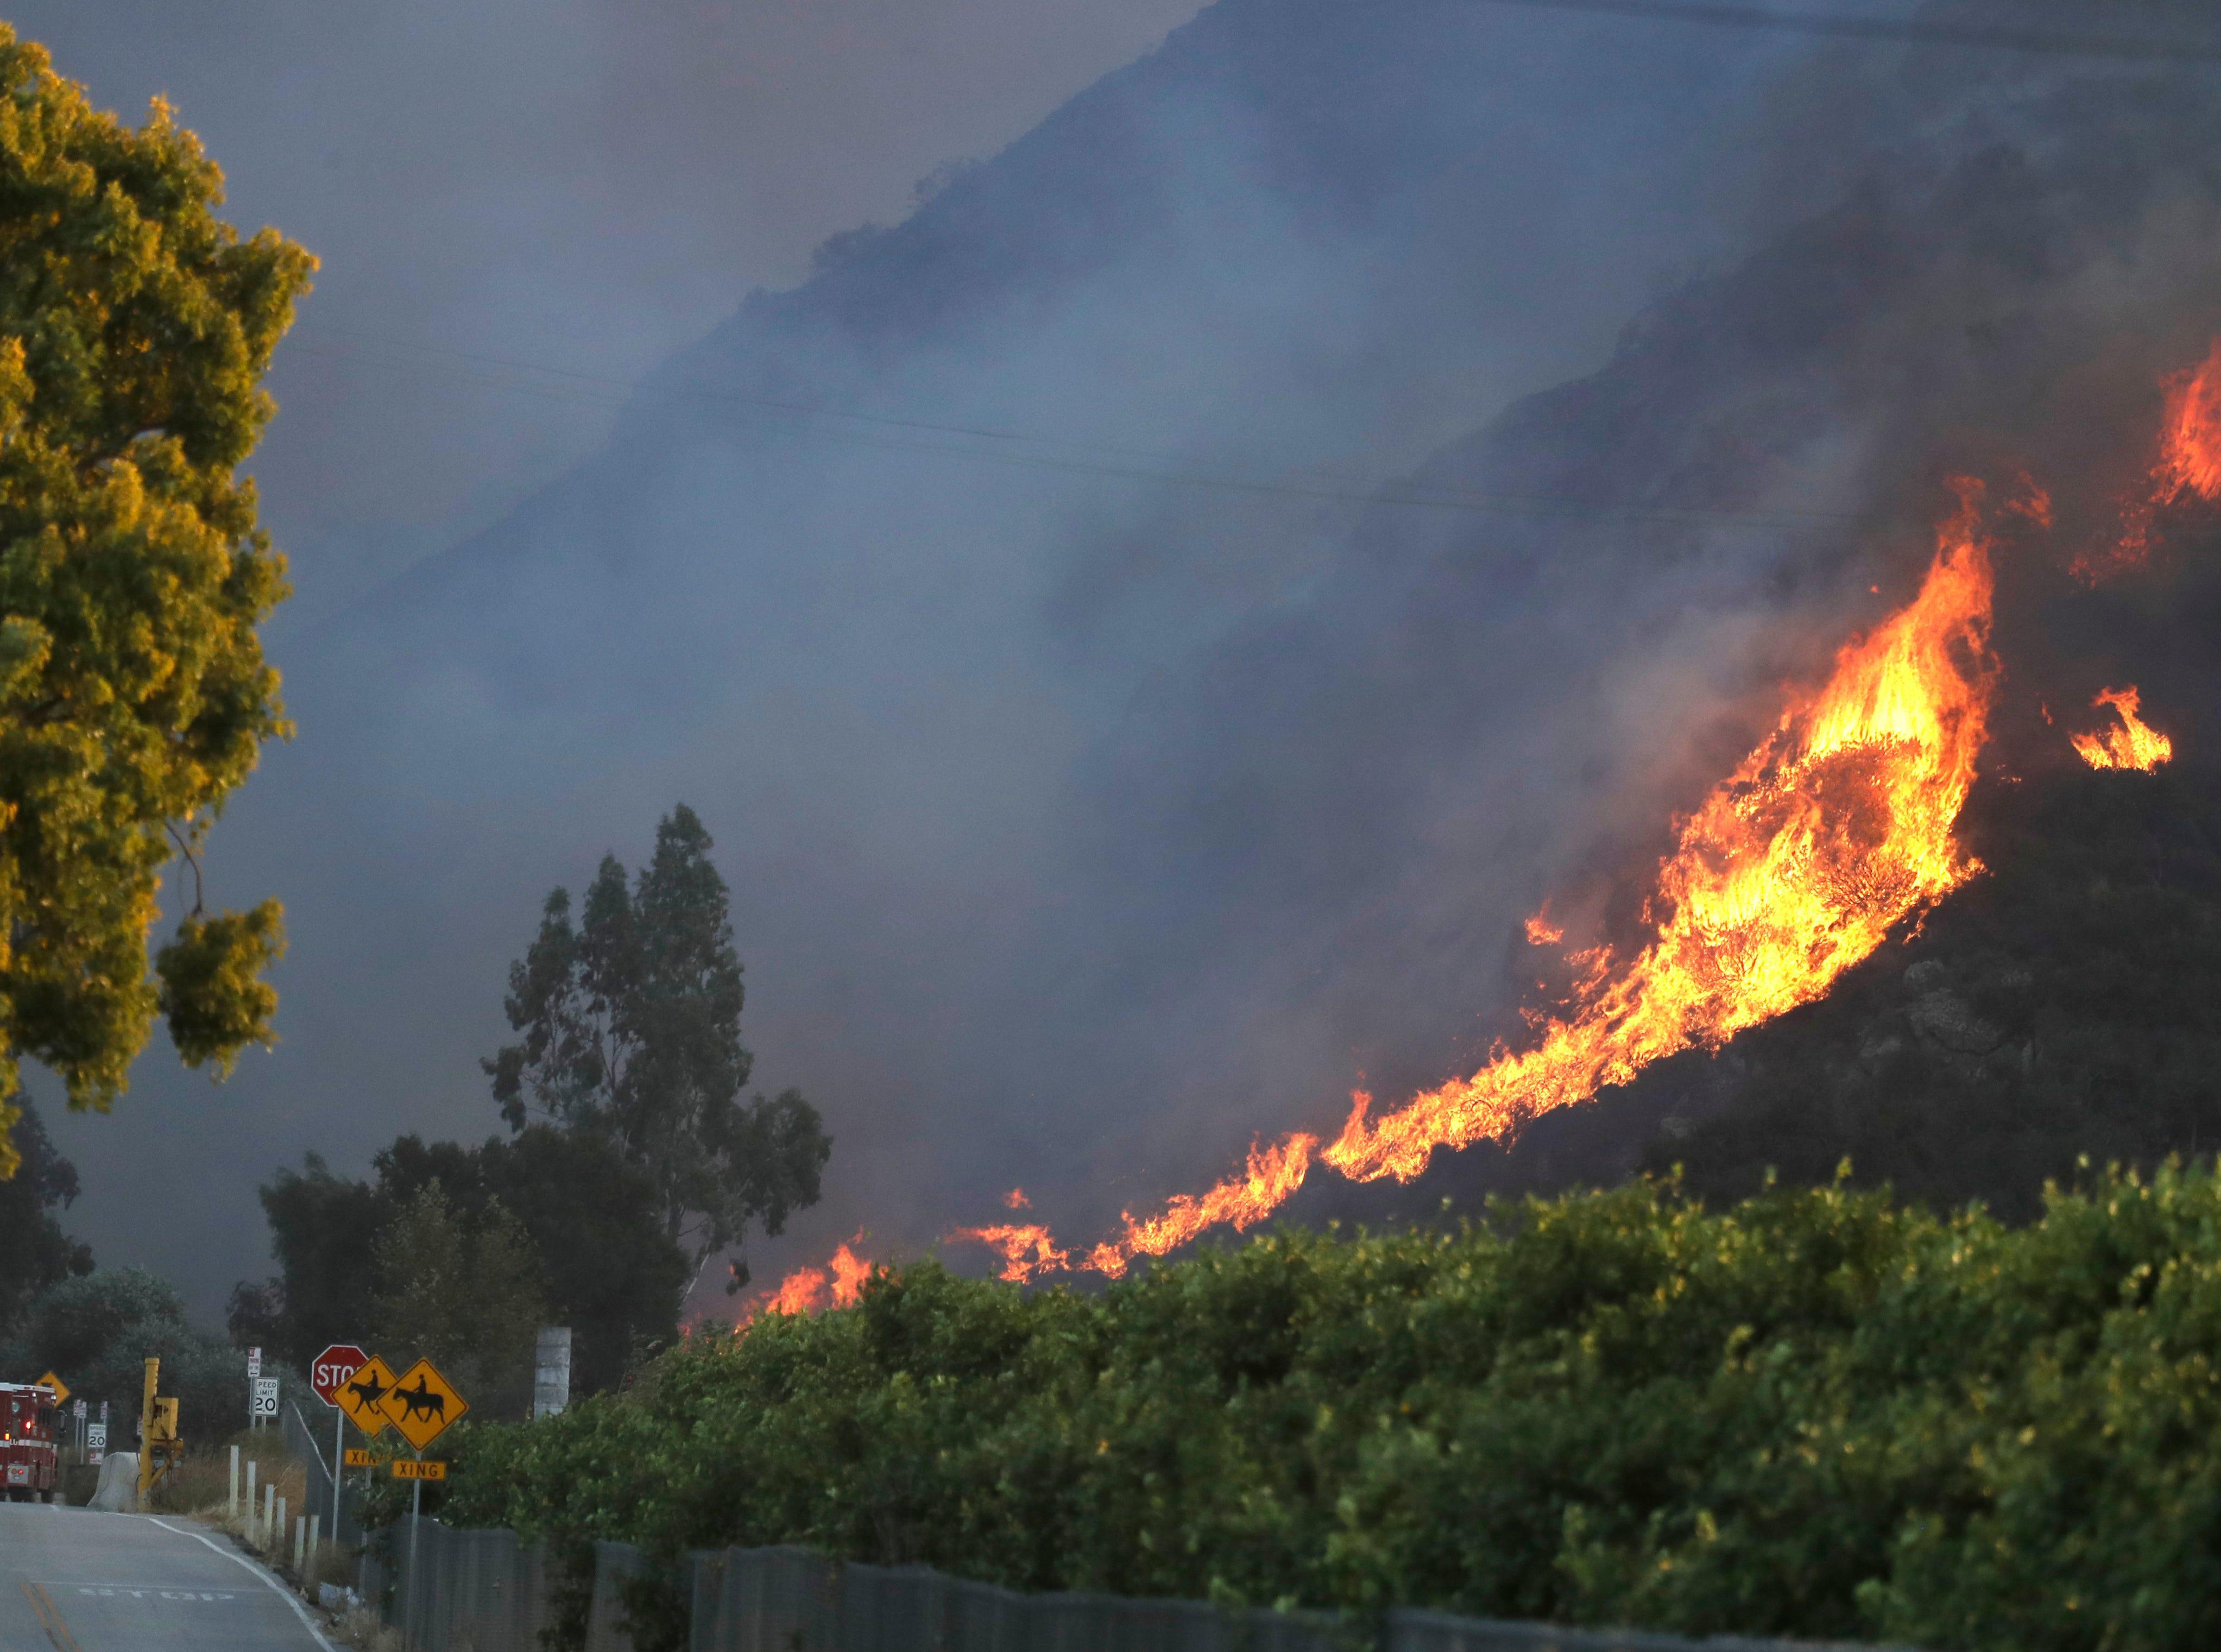 A wildfire comes down from a hilltop Thursday, Nov. 8, 2018, near Newbury Park, Calif.